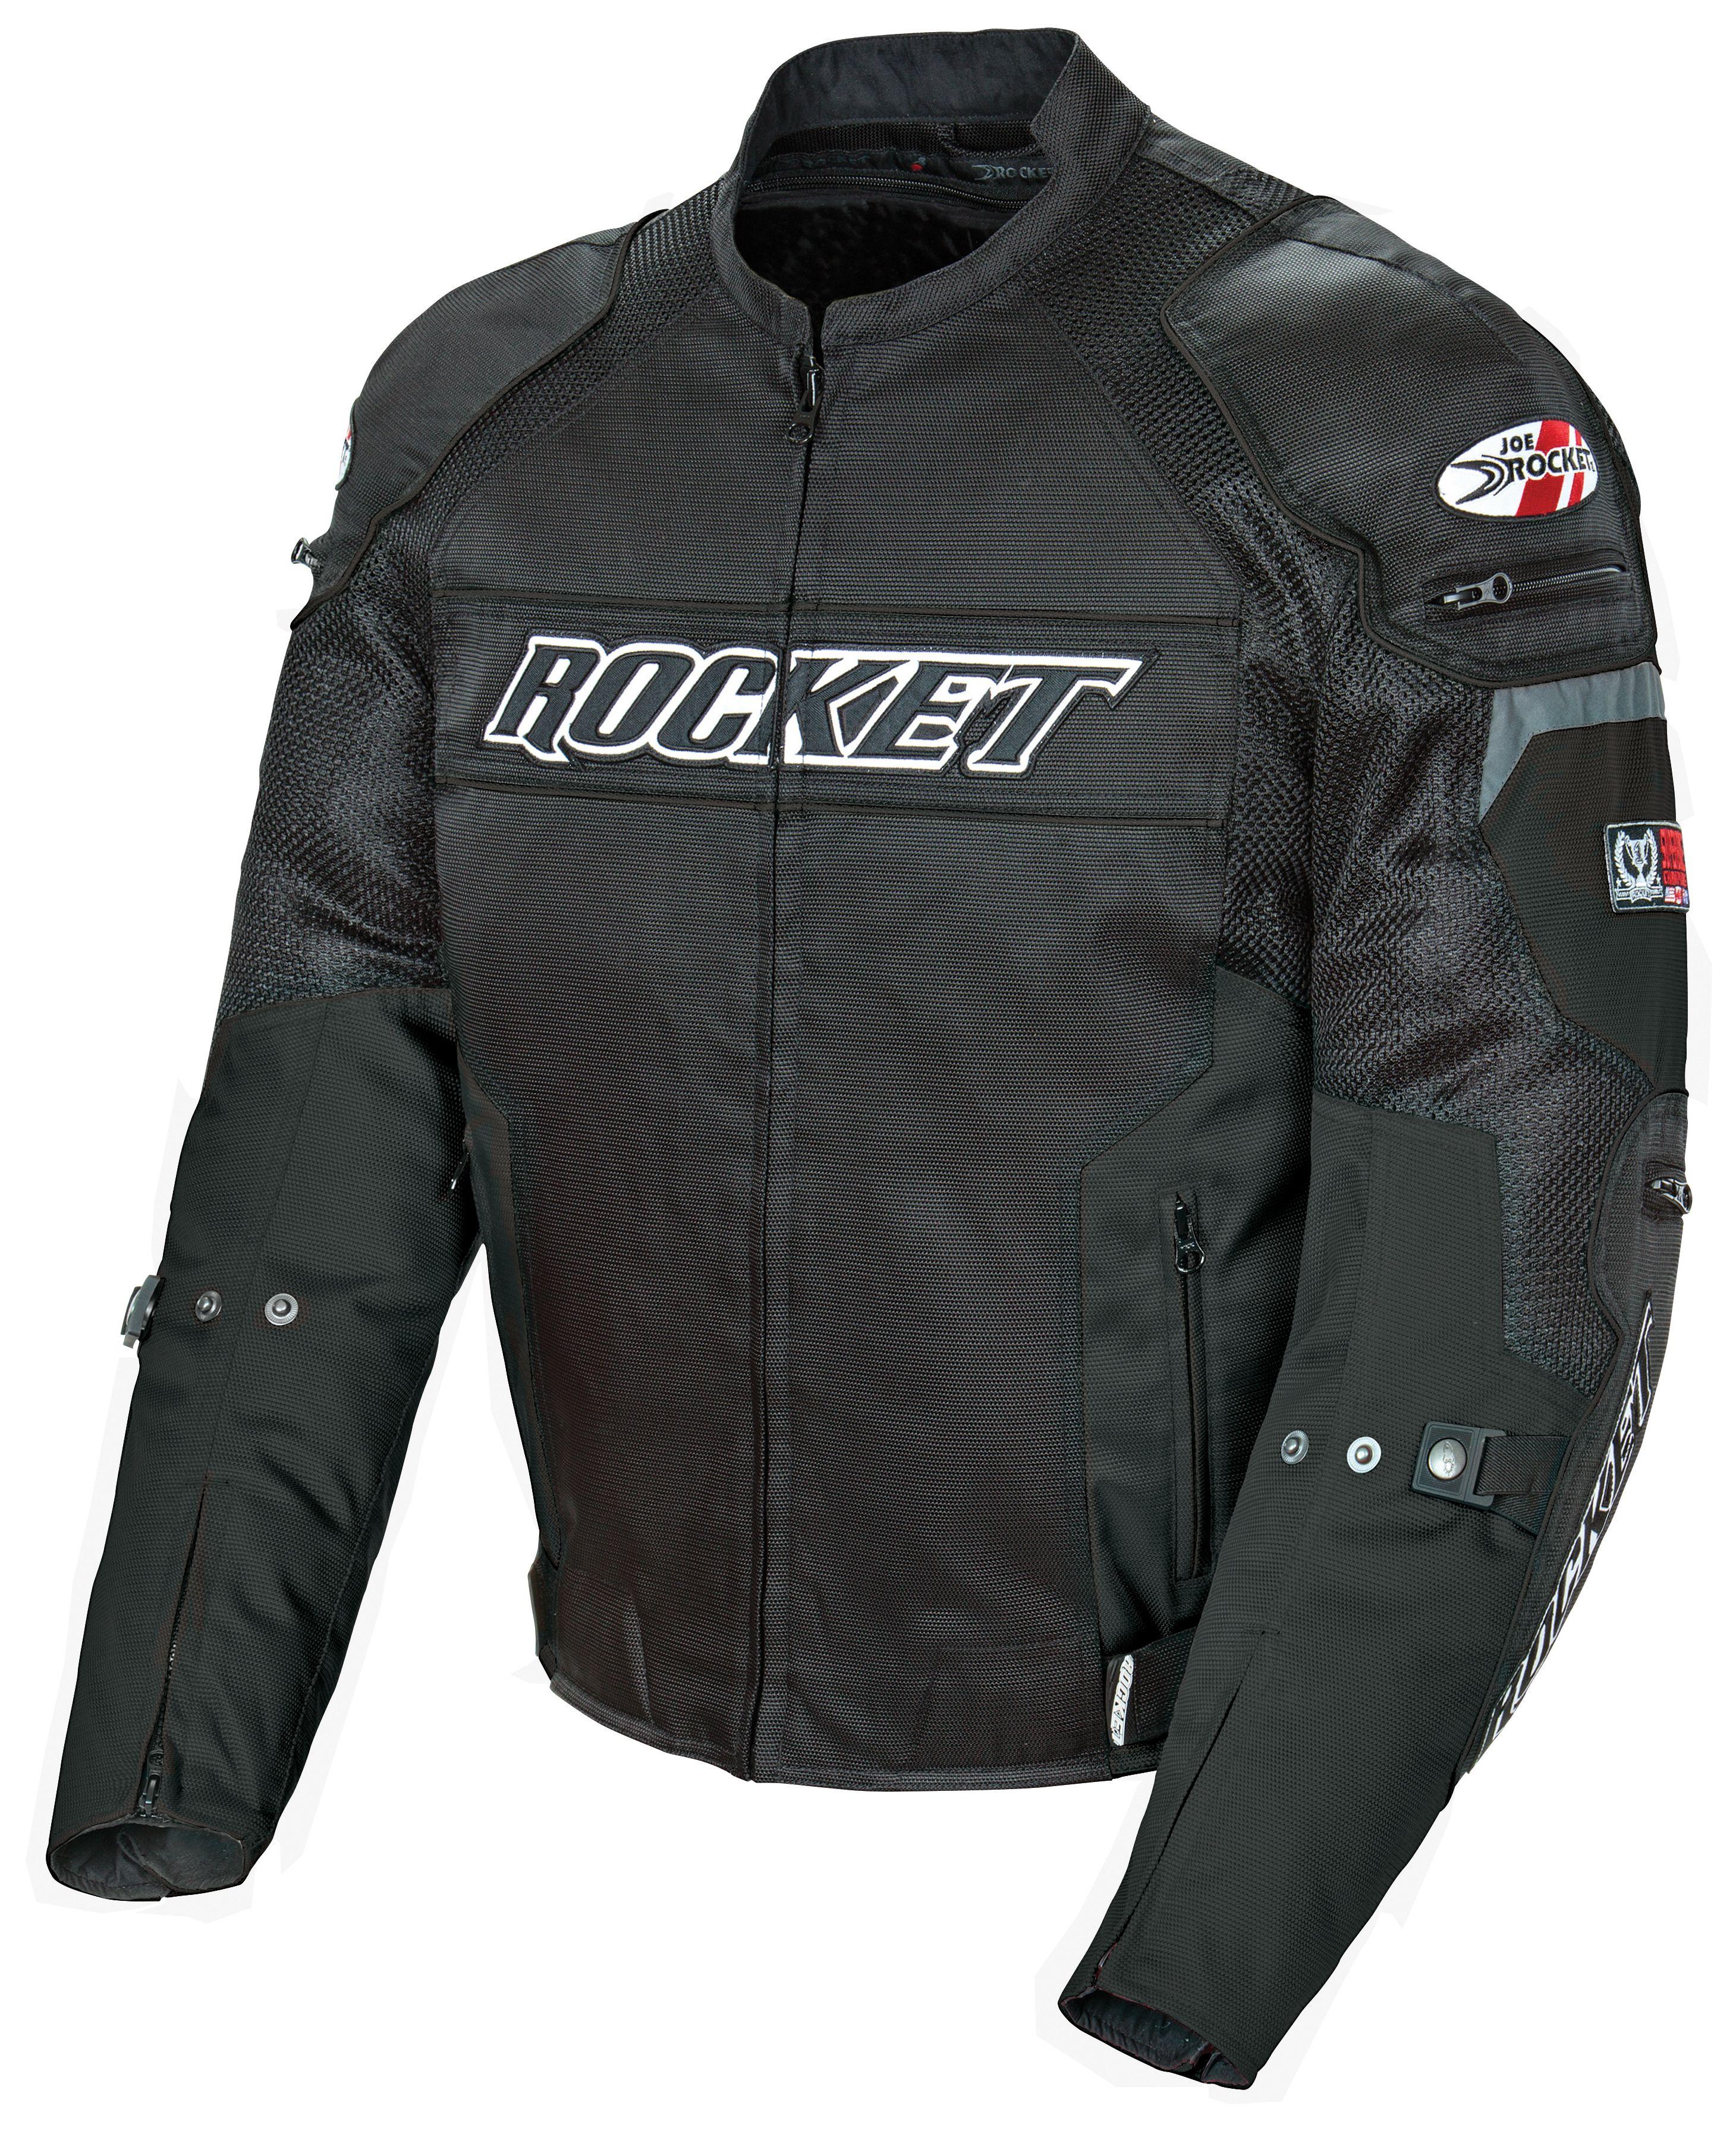 Joe Rocket Resistor Jacket Cycle Gear